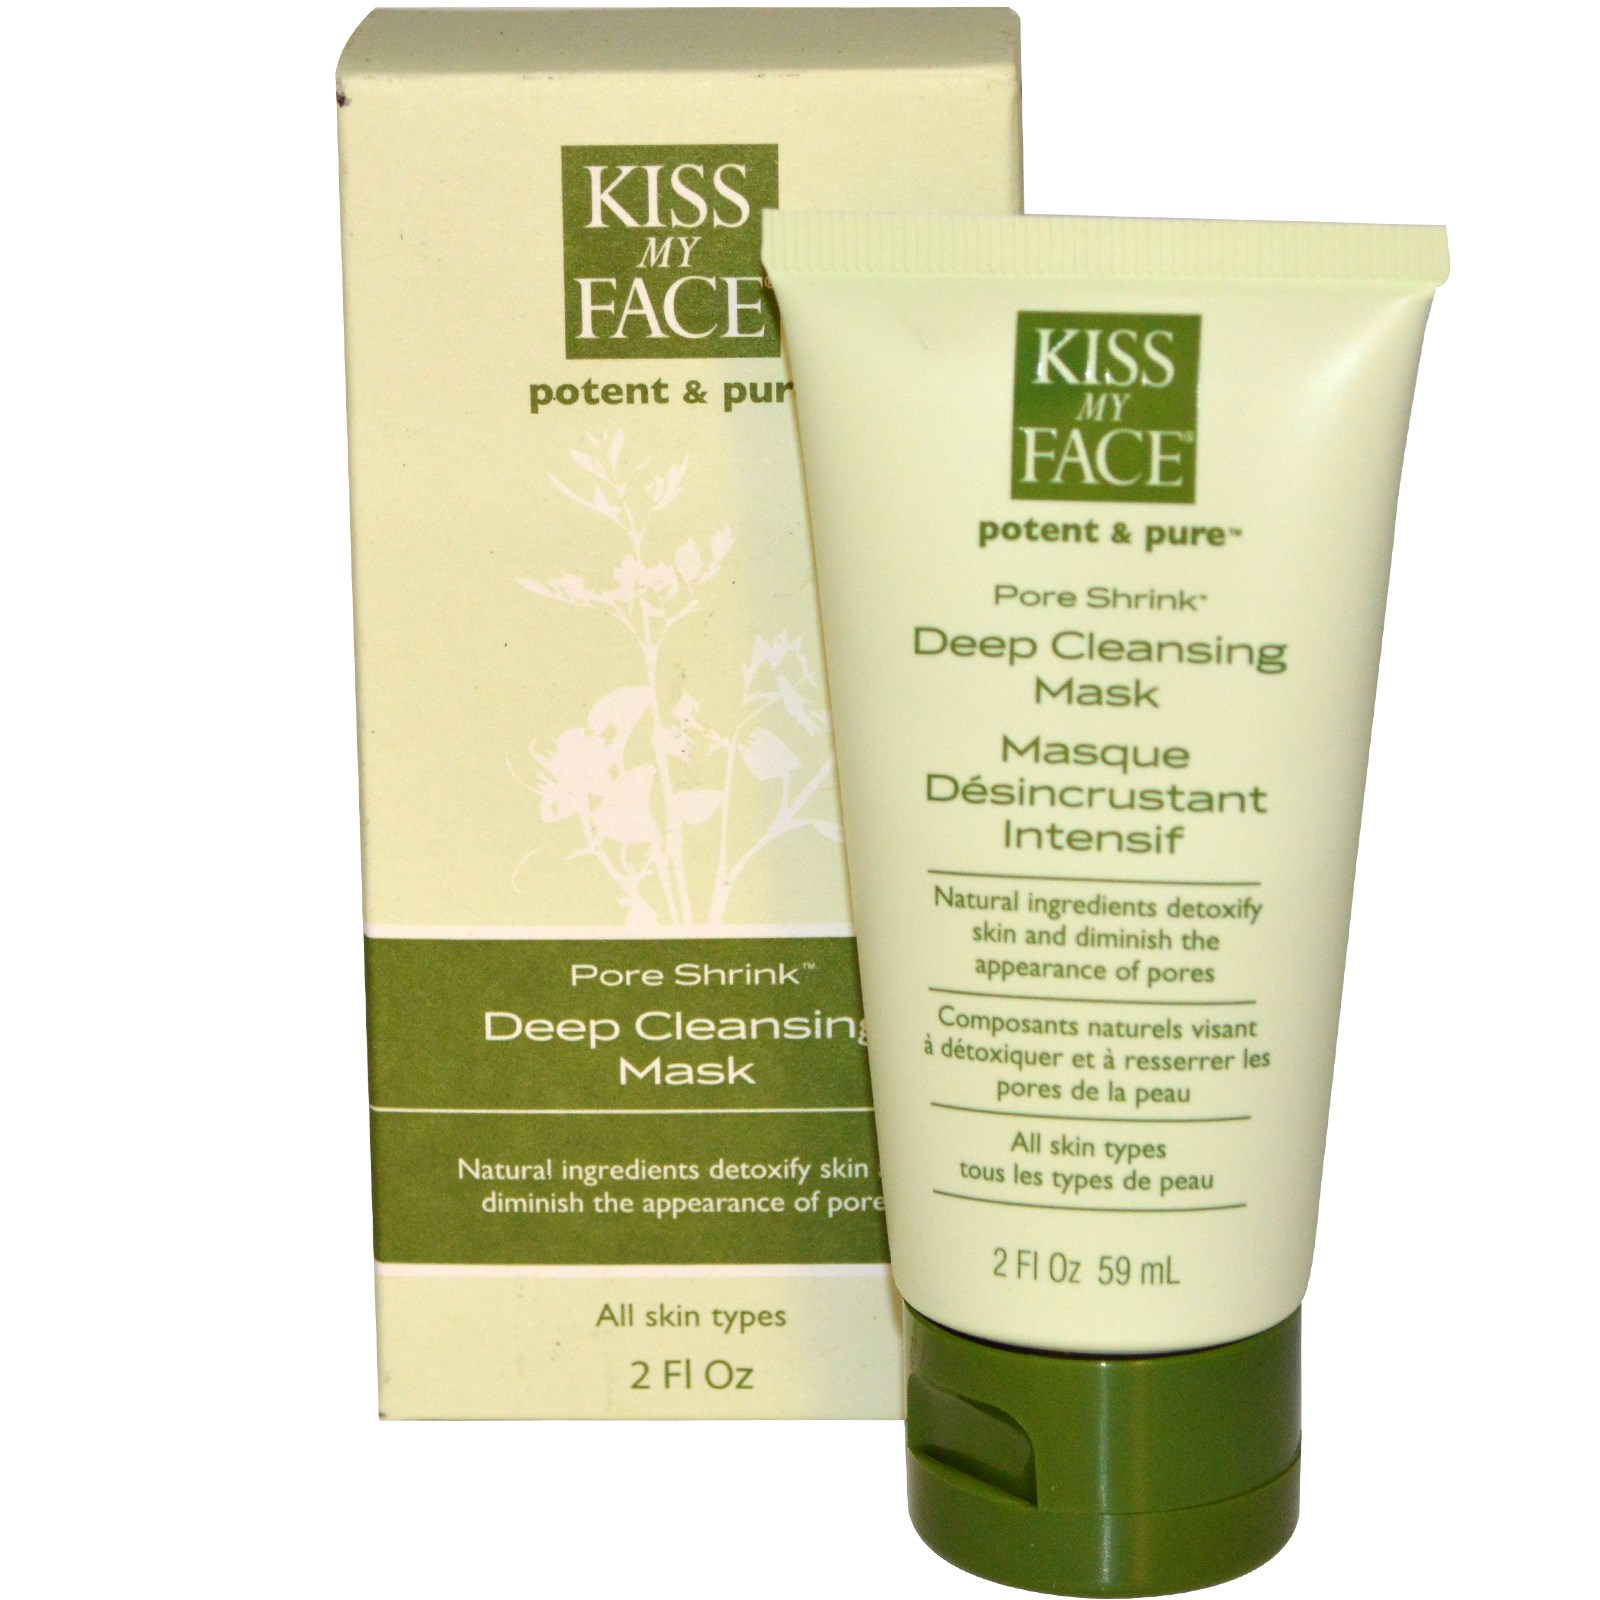 5575b594e افضل منتجات للبشرة الحساسة والجسم من kiss my face اي هيرب - مدونة اي ...